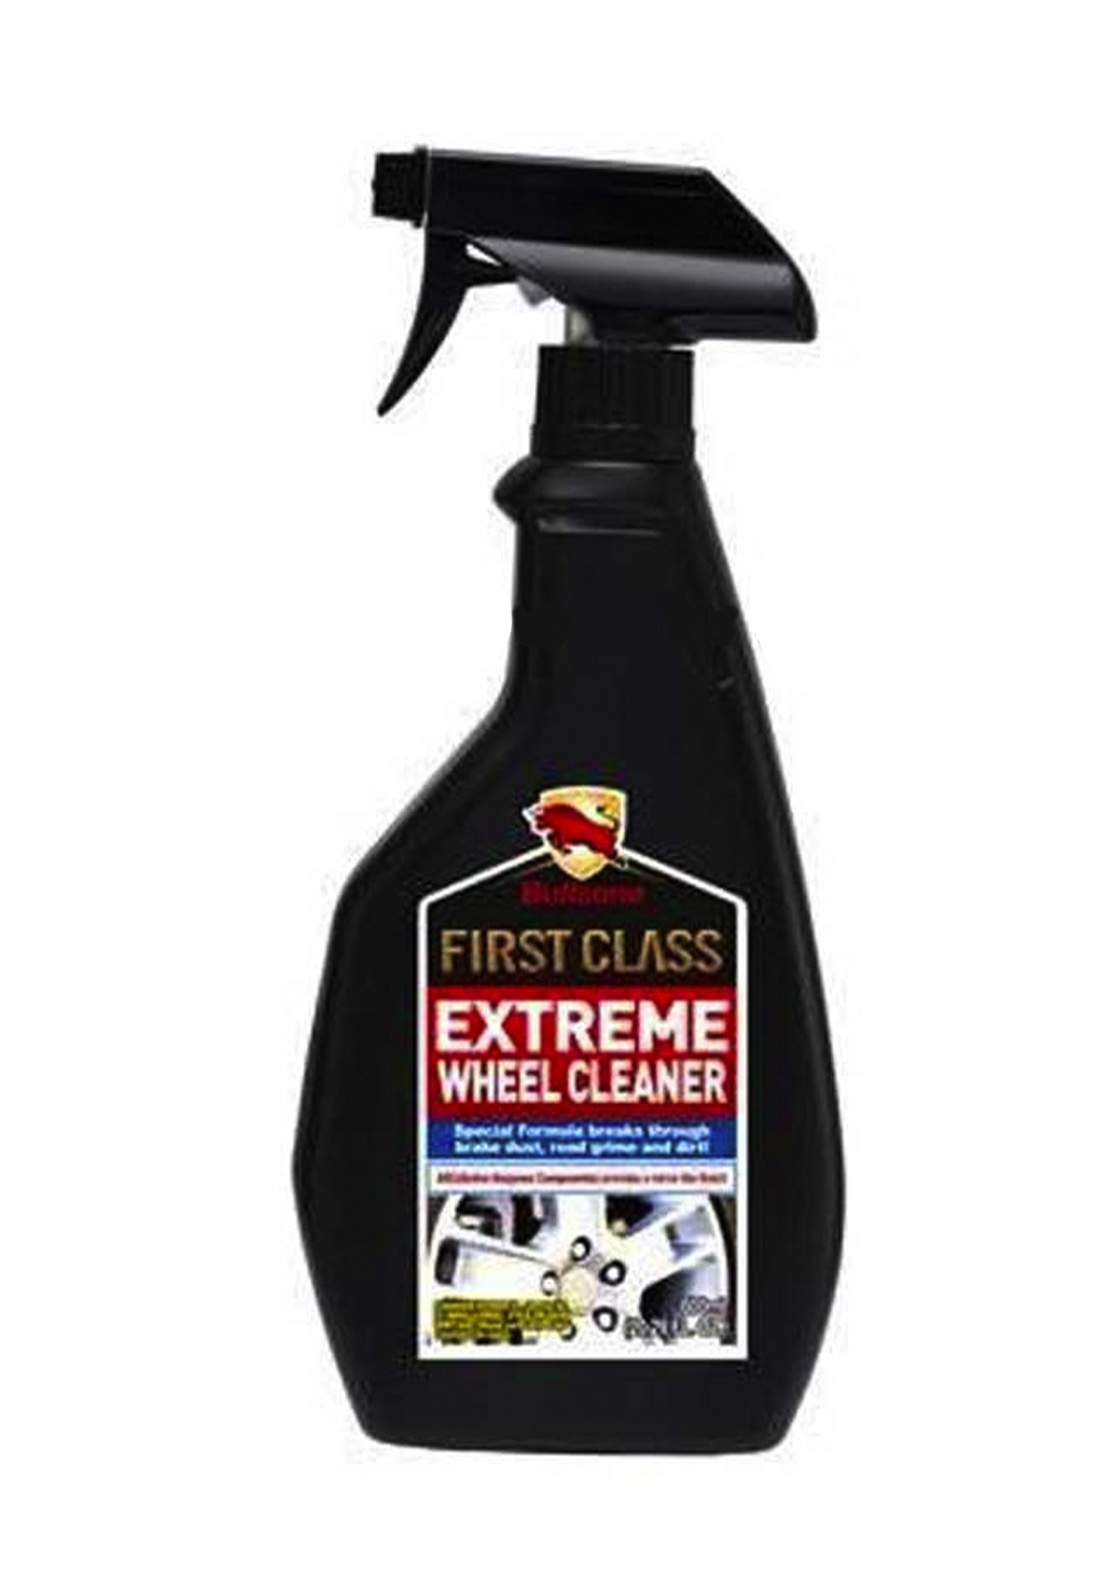 Bullsone First Class Extreme Wheel Cleaner 600 ml منظف الإطارات والعجلات